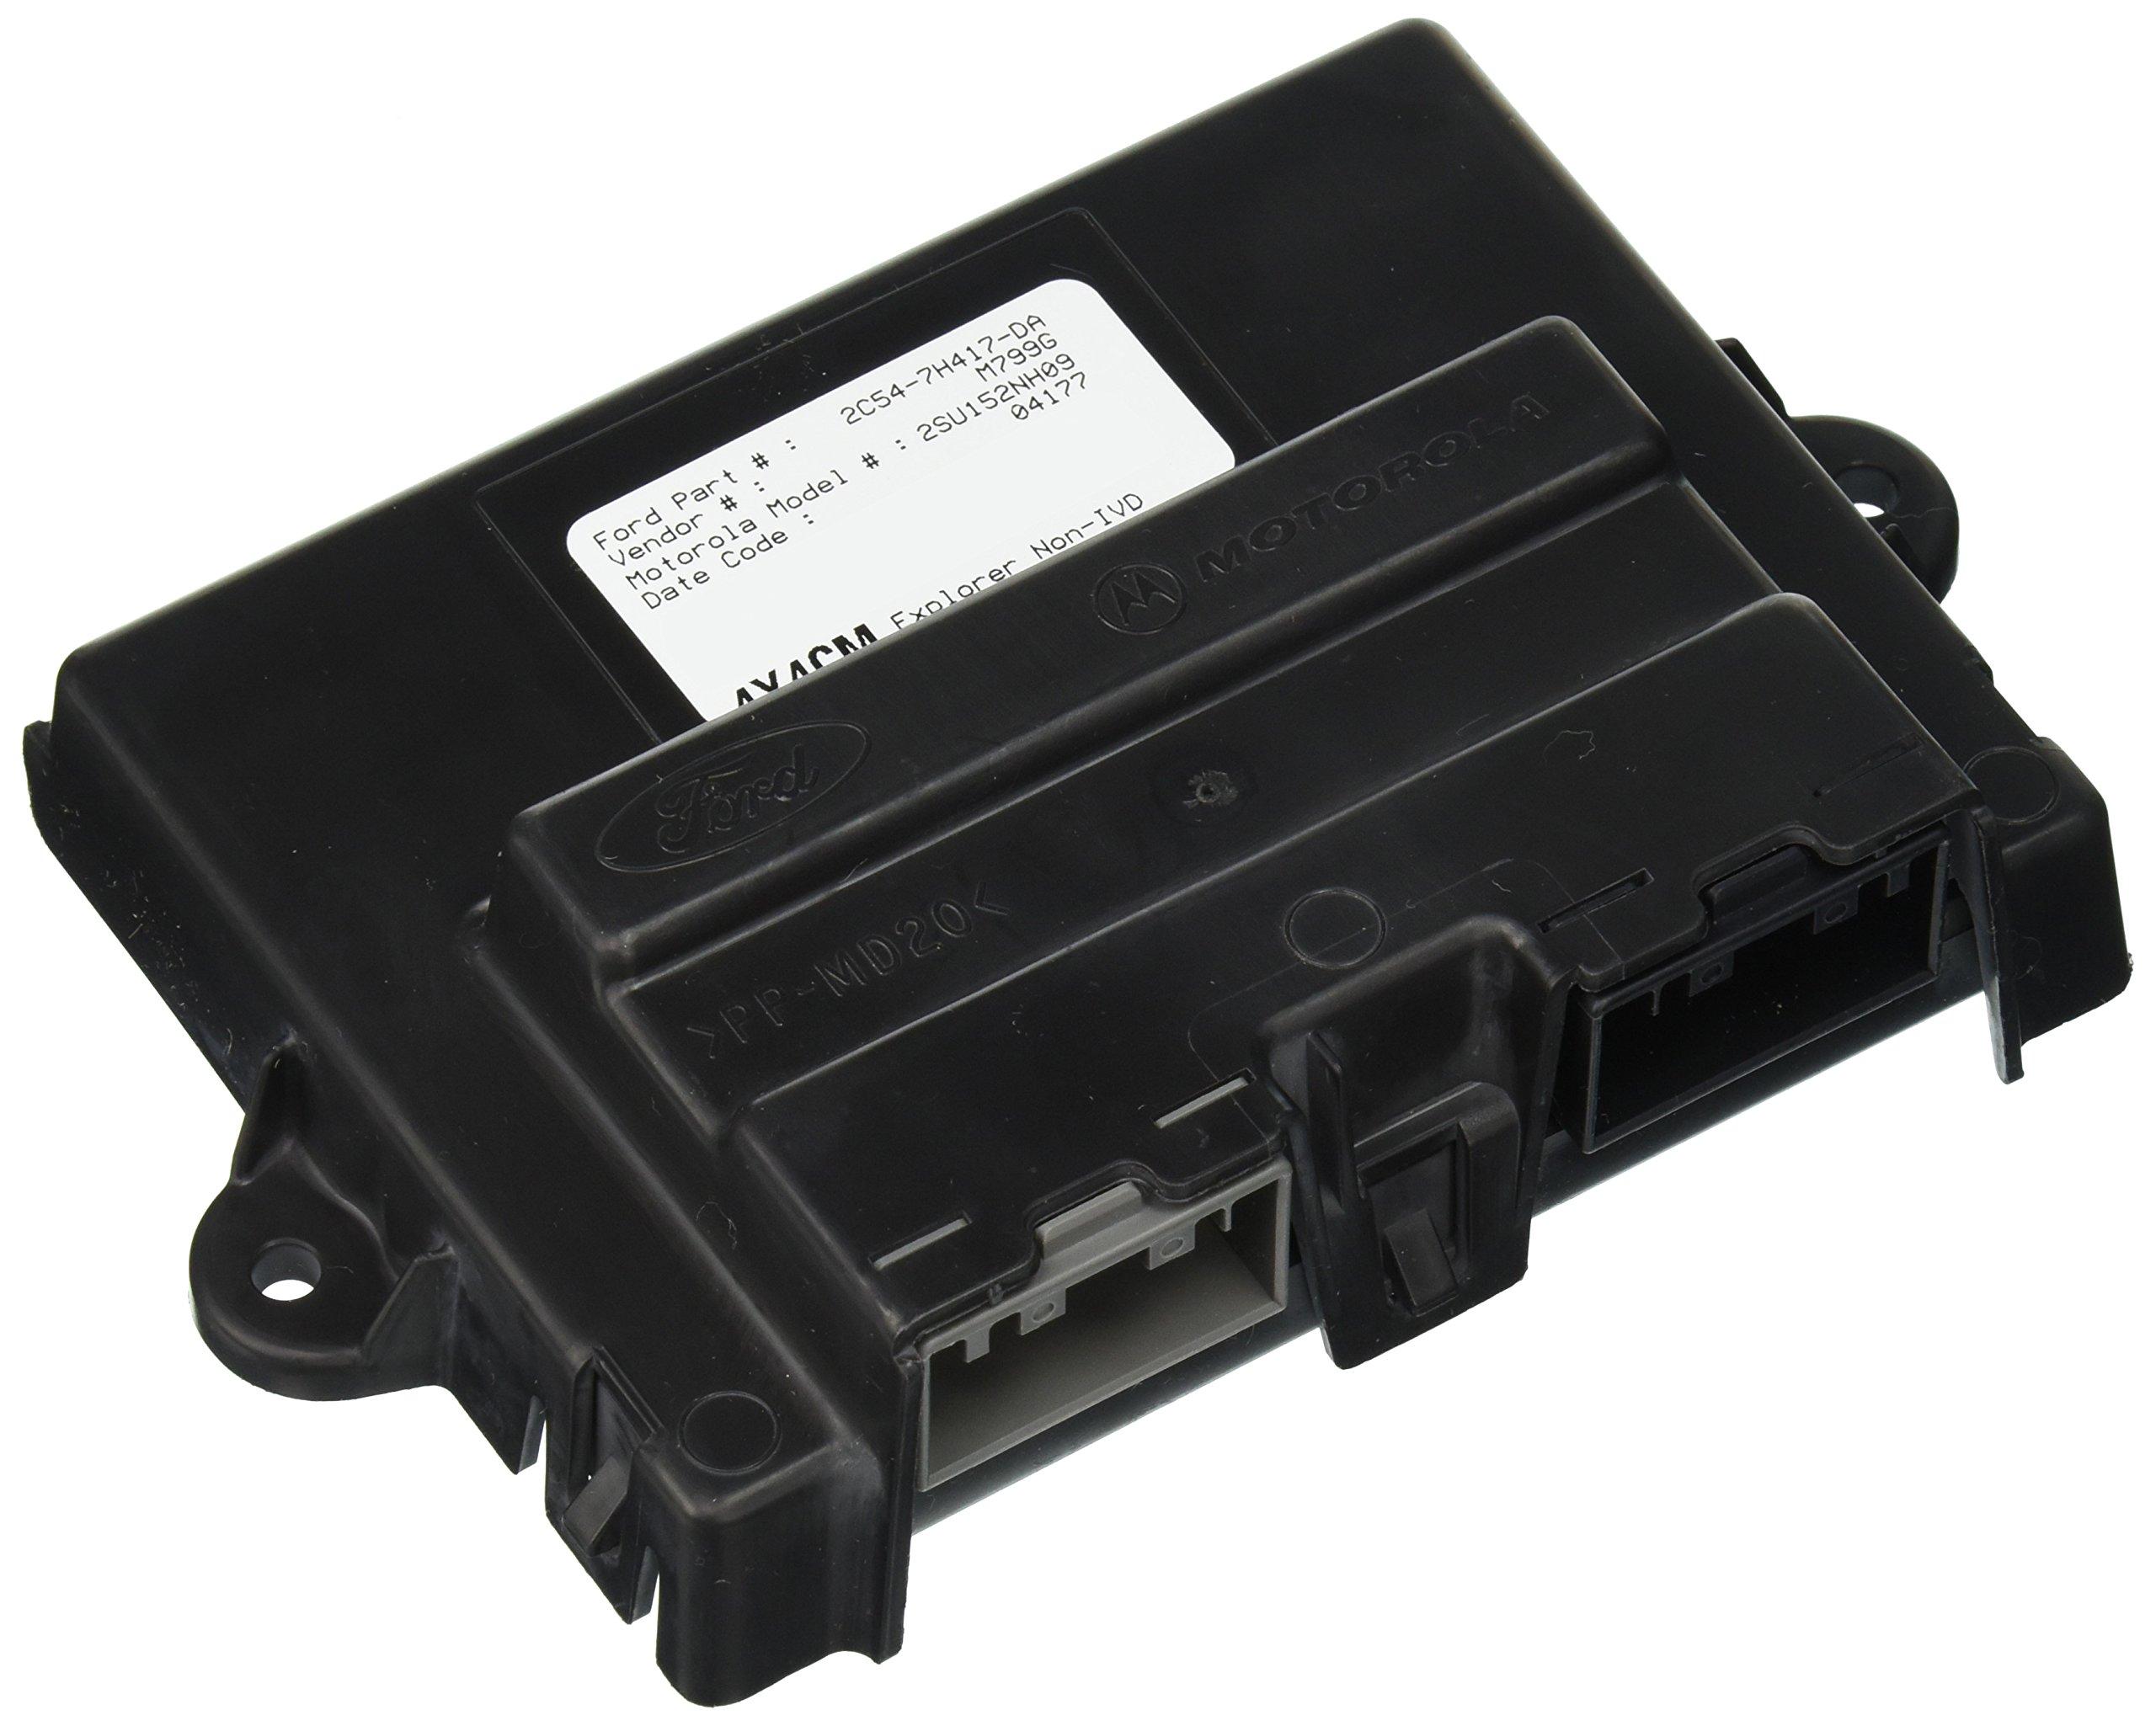 Motorcraft TM122 Automatic Transmission Modulator